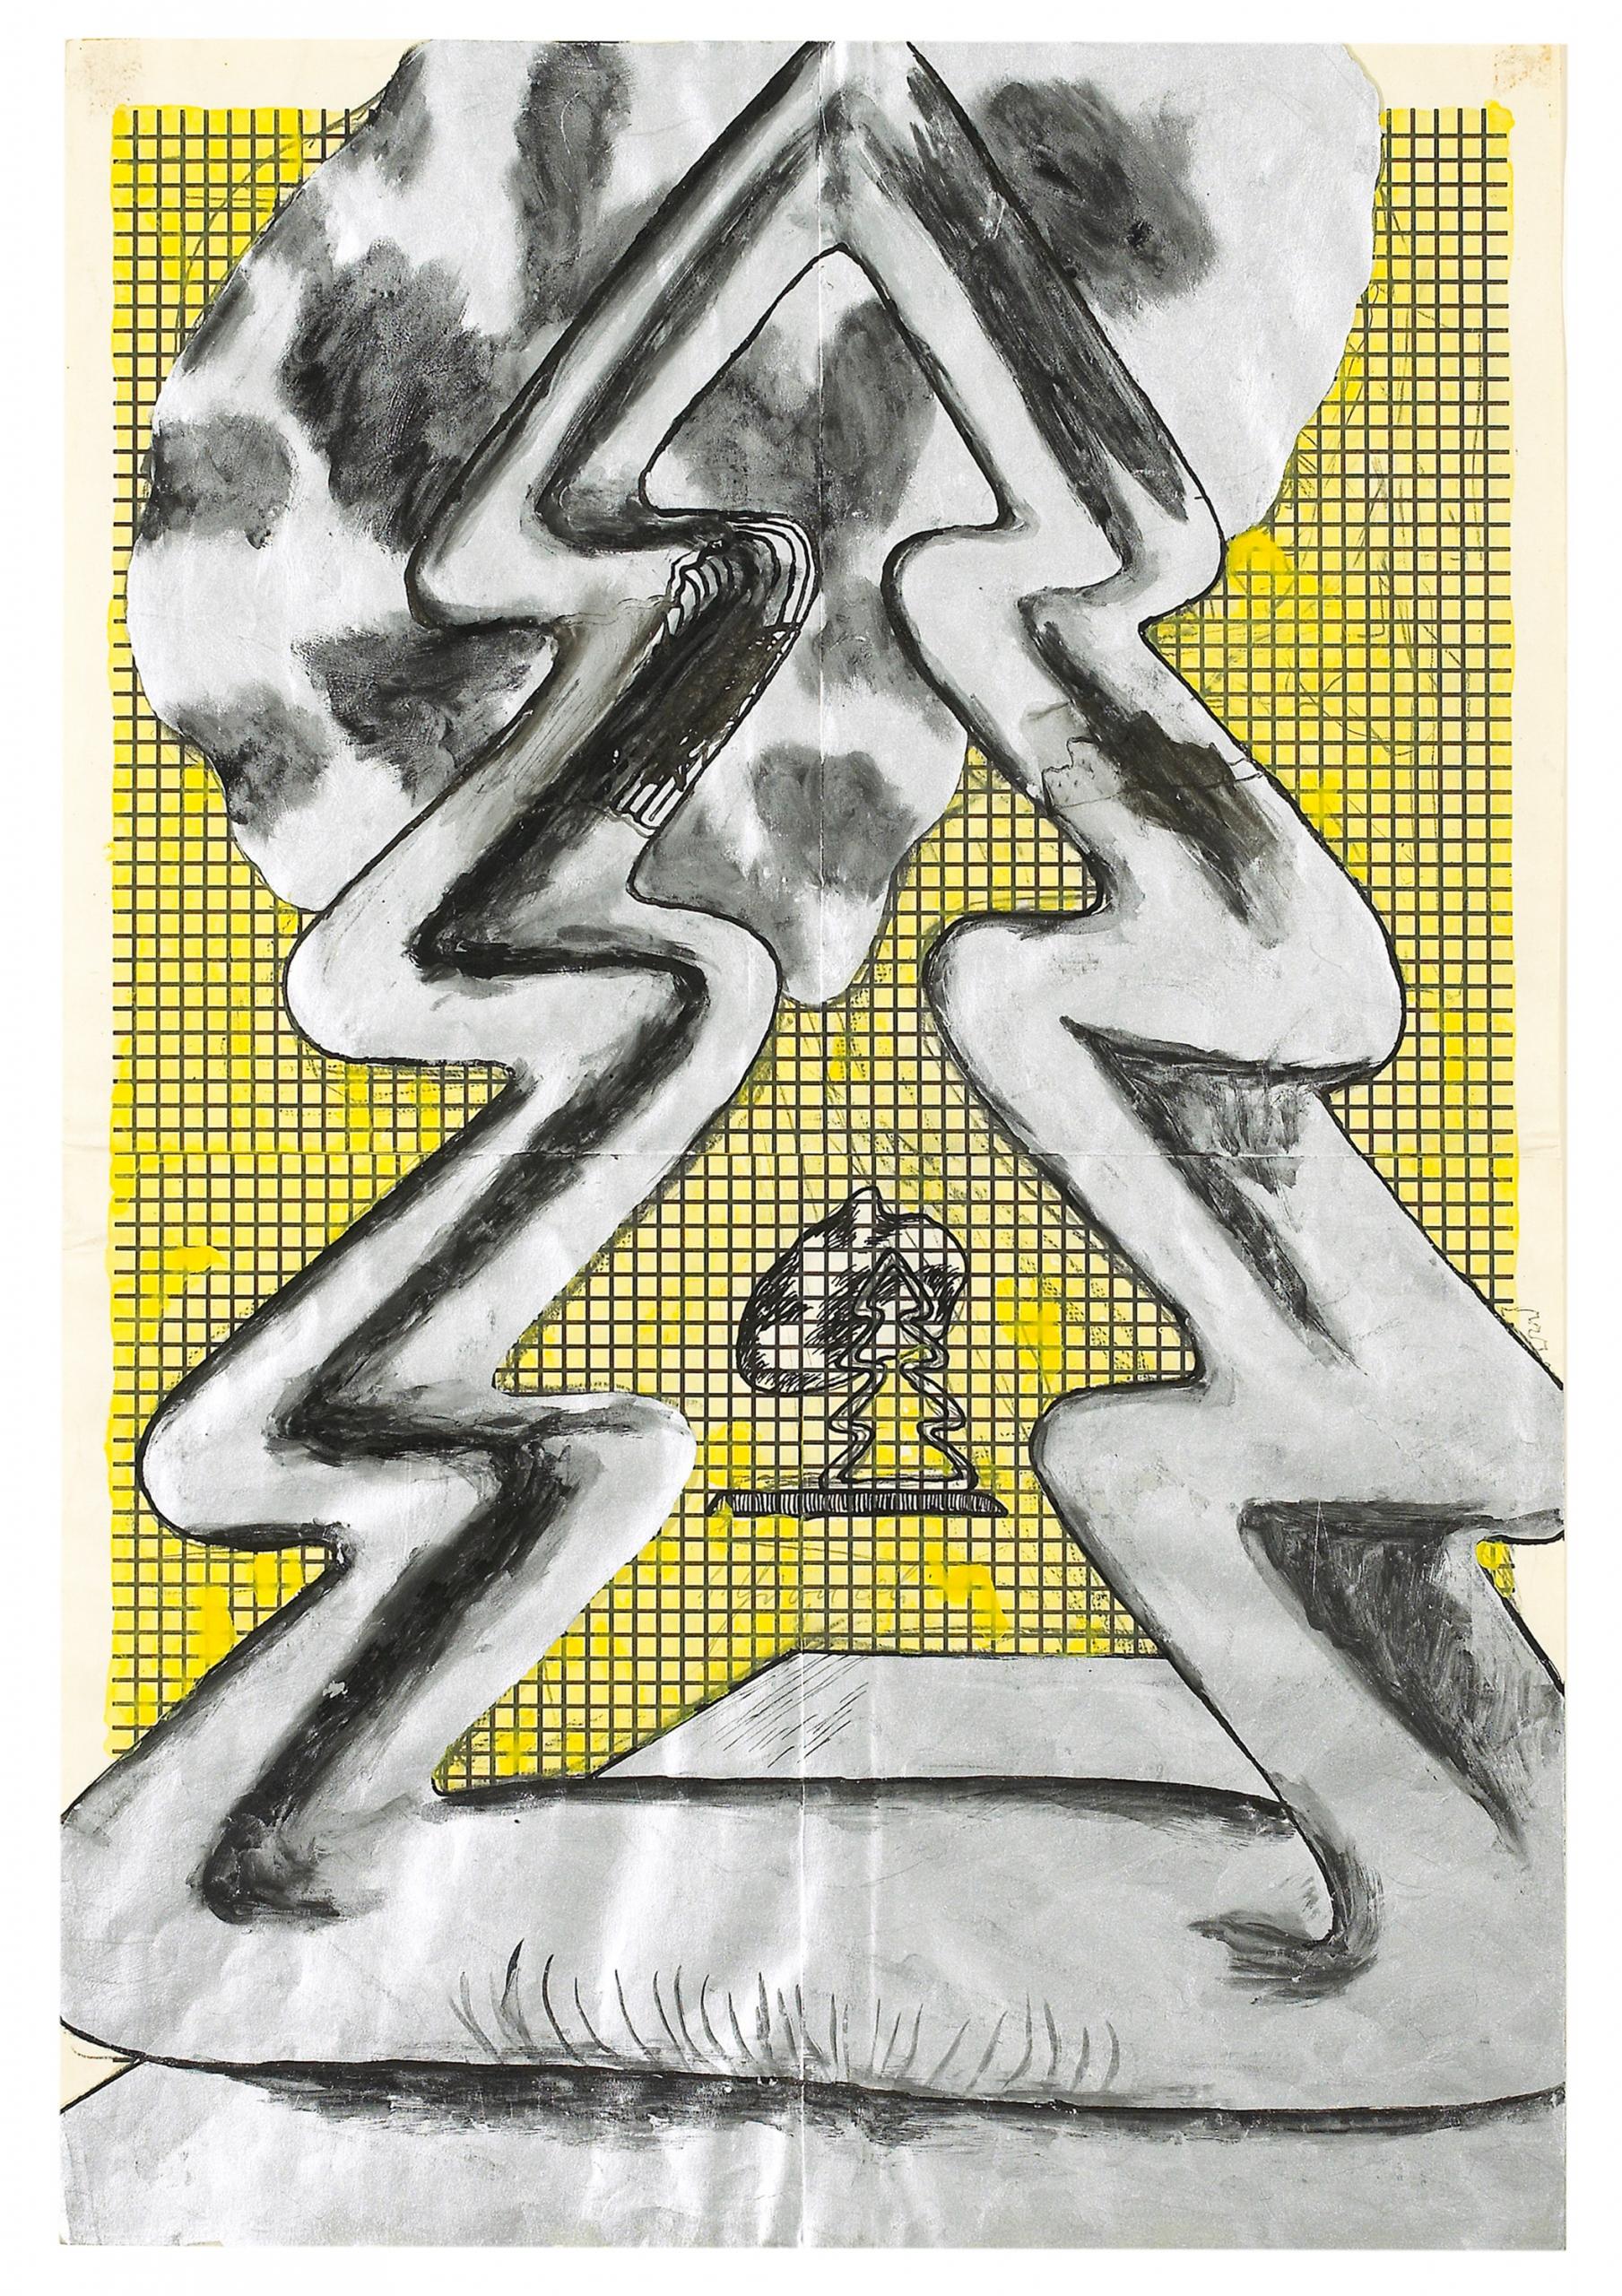 Bruno Gironcoli, Ohne Titel / untitled